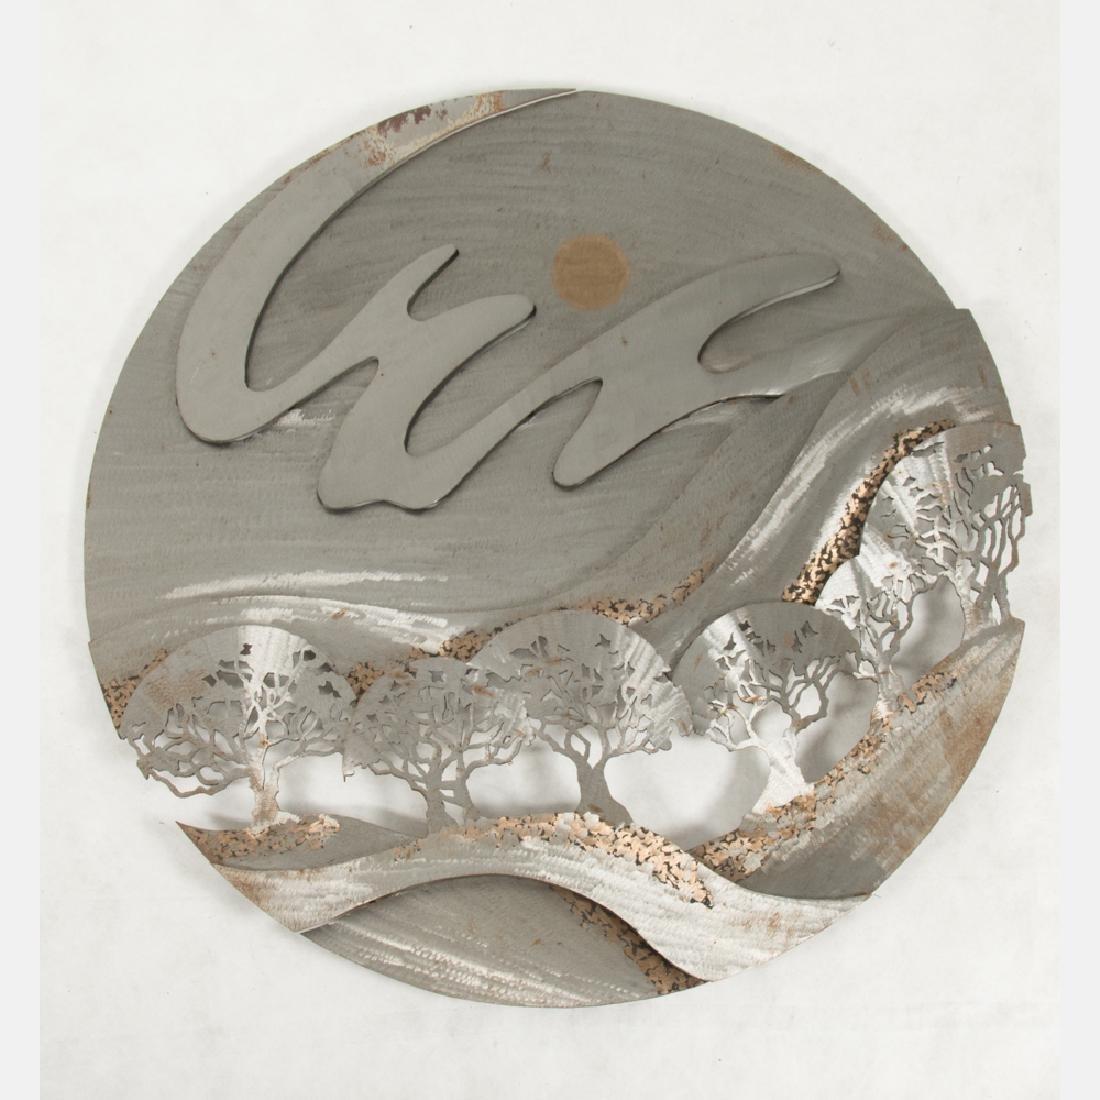 John Richen (20th Century) Untitled, Cut metal wall